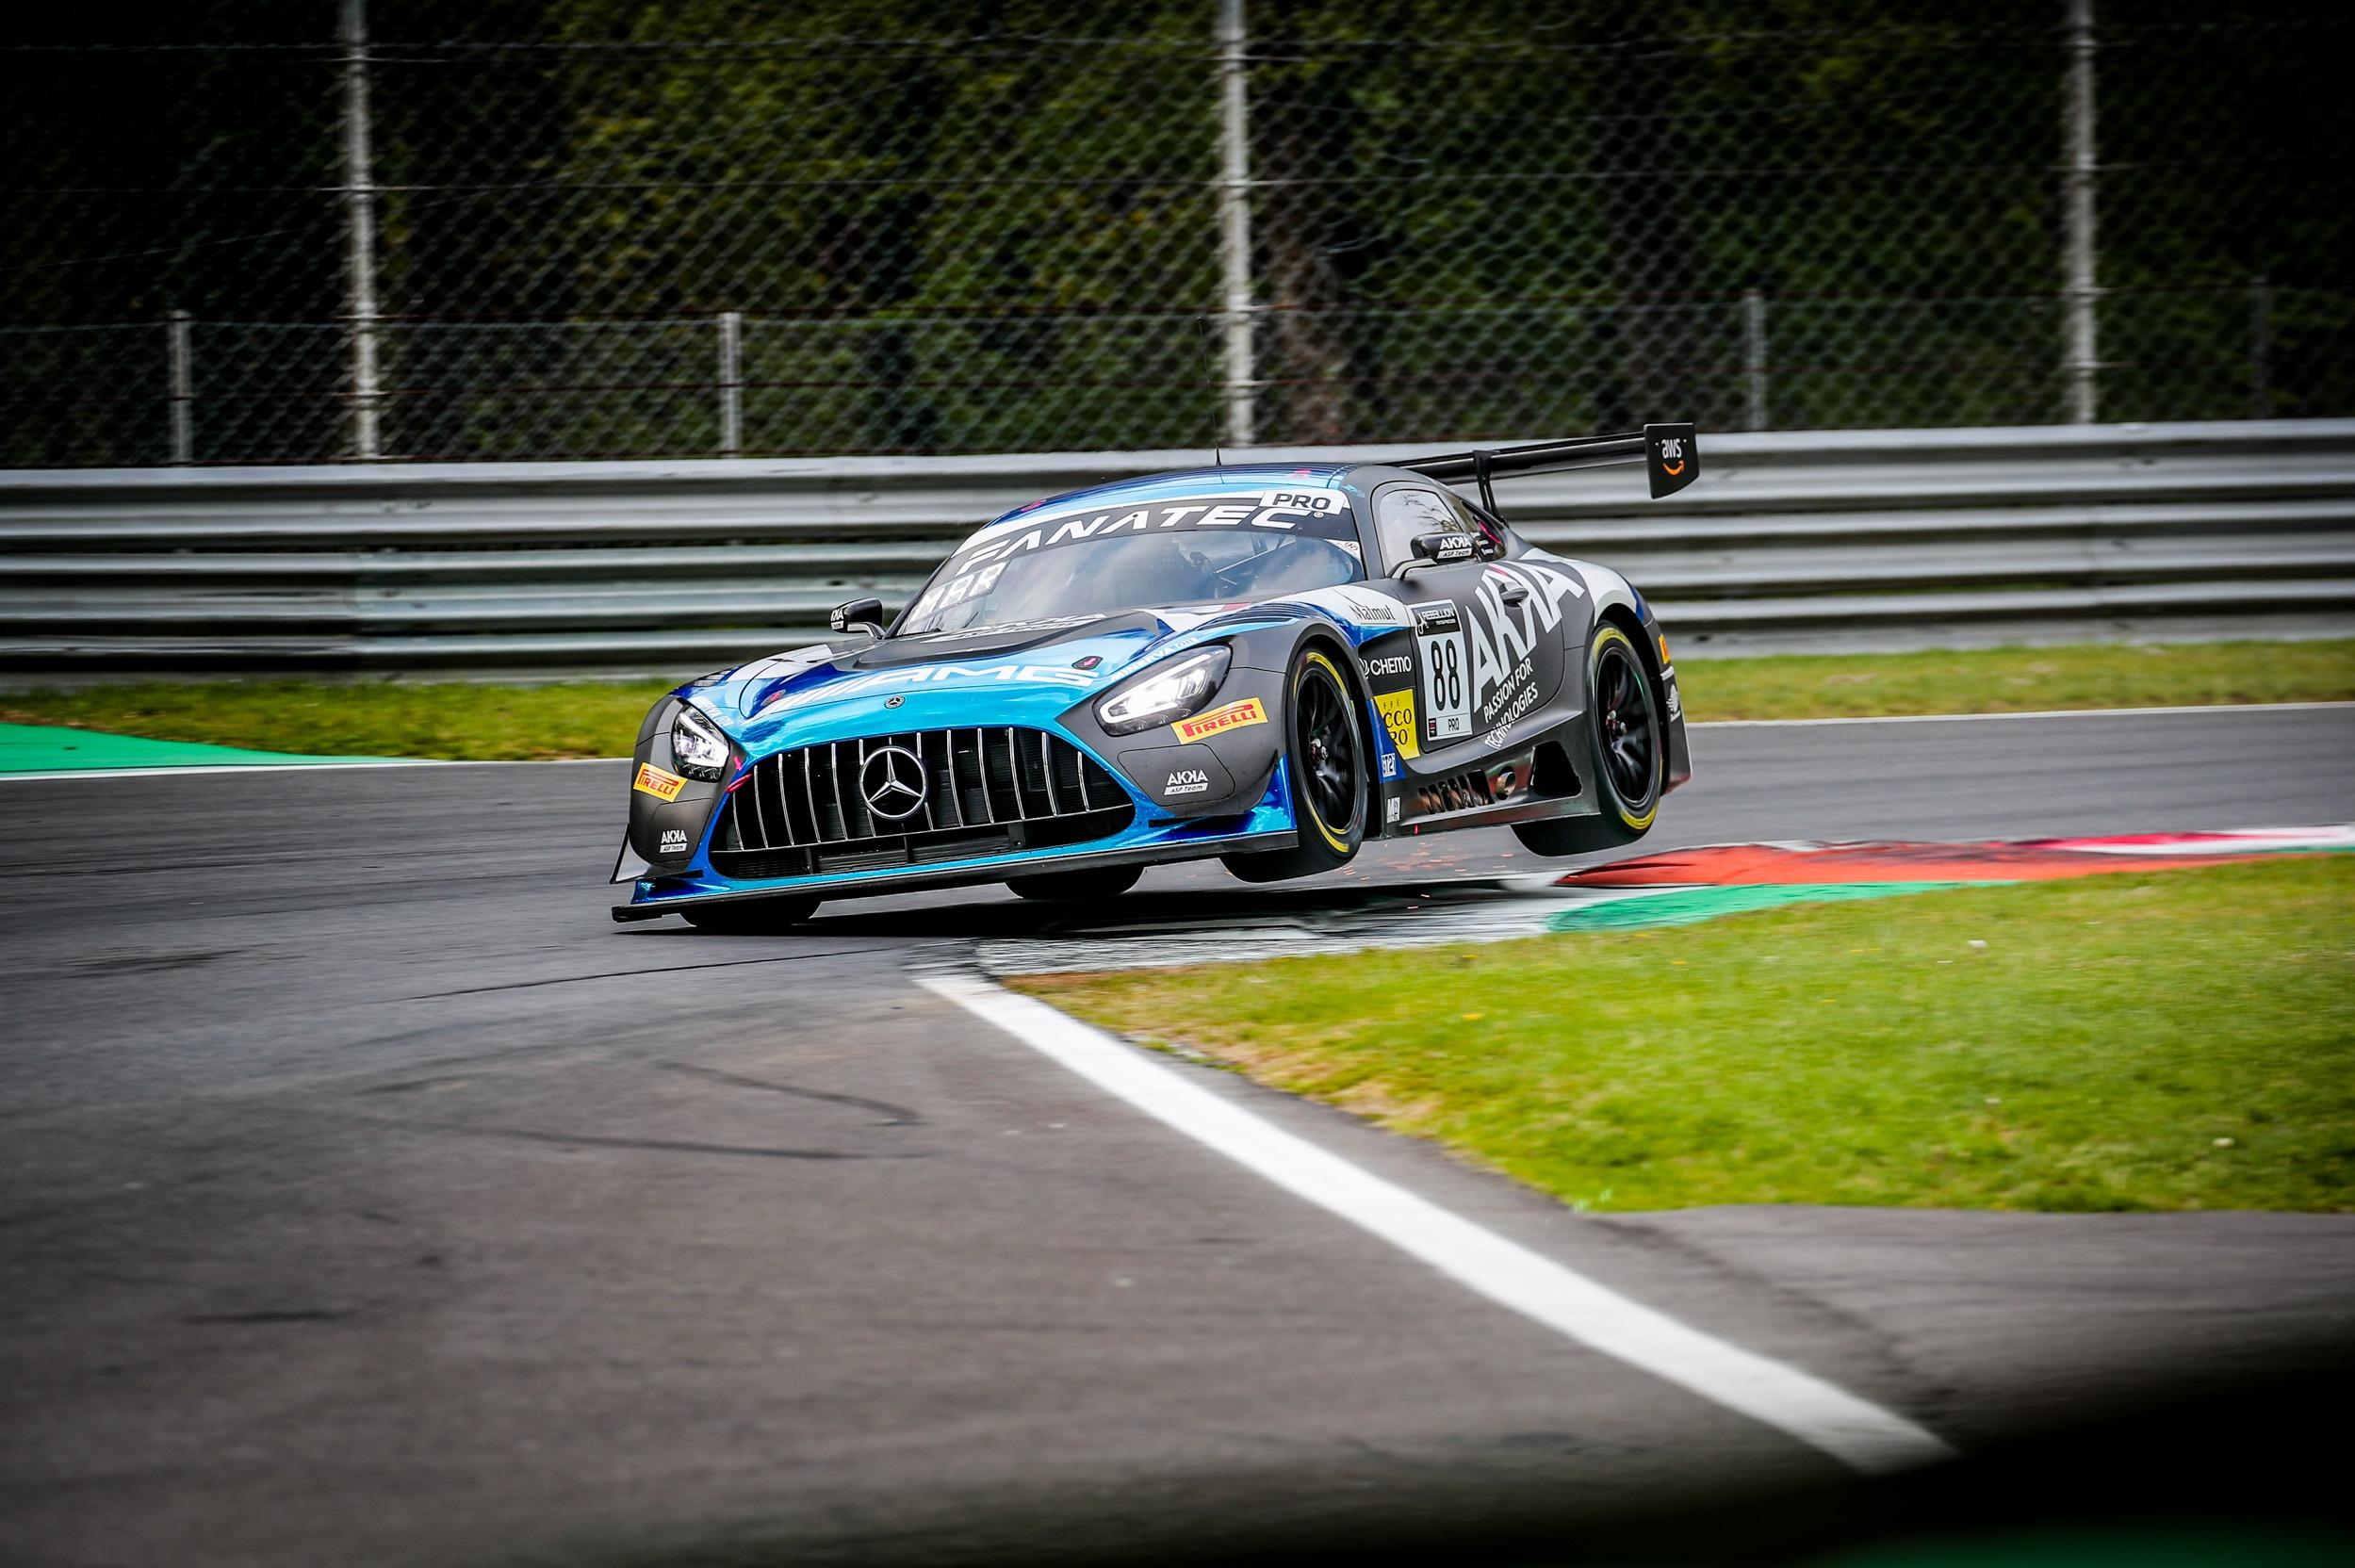 #88 AKKA ASP FRA Mercedes-AMG GT3 Raffaele Marciello ITA Dani Juncadella ESP Jules Gounon FRA Pro Cup, GT3, Qualifying